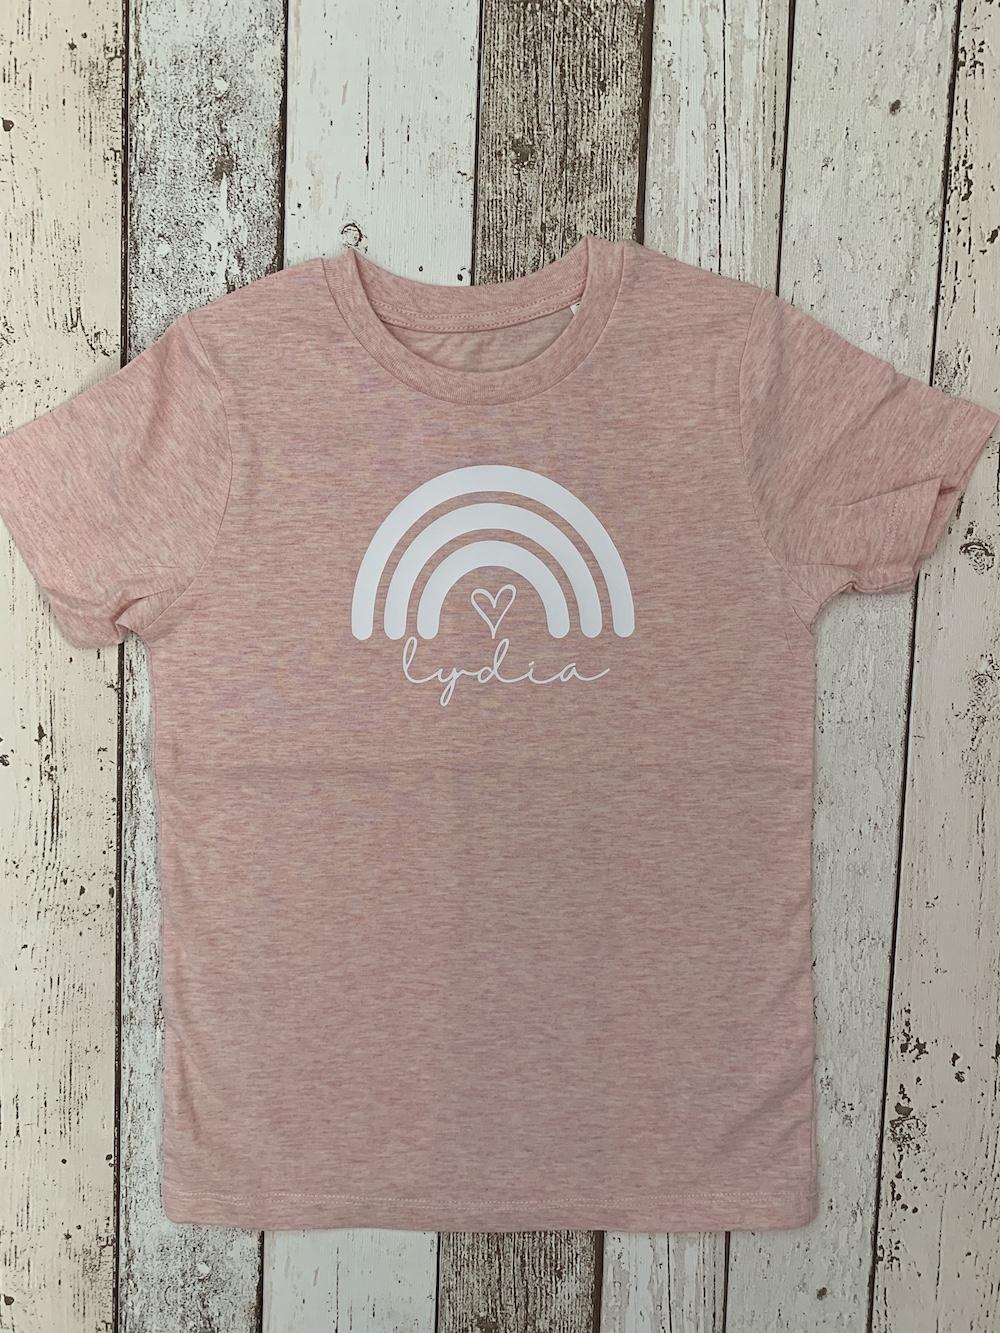 Rainbow Personalised Tshirt – Pink And White